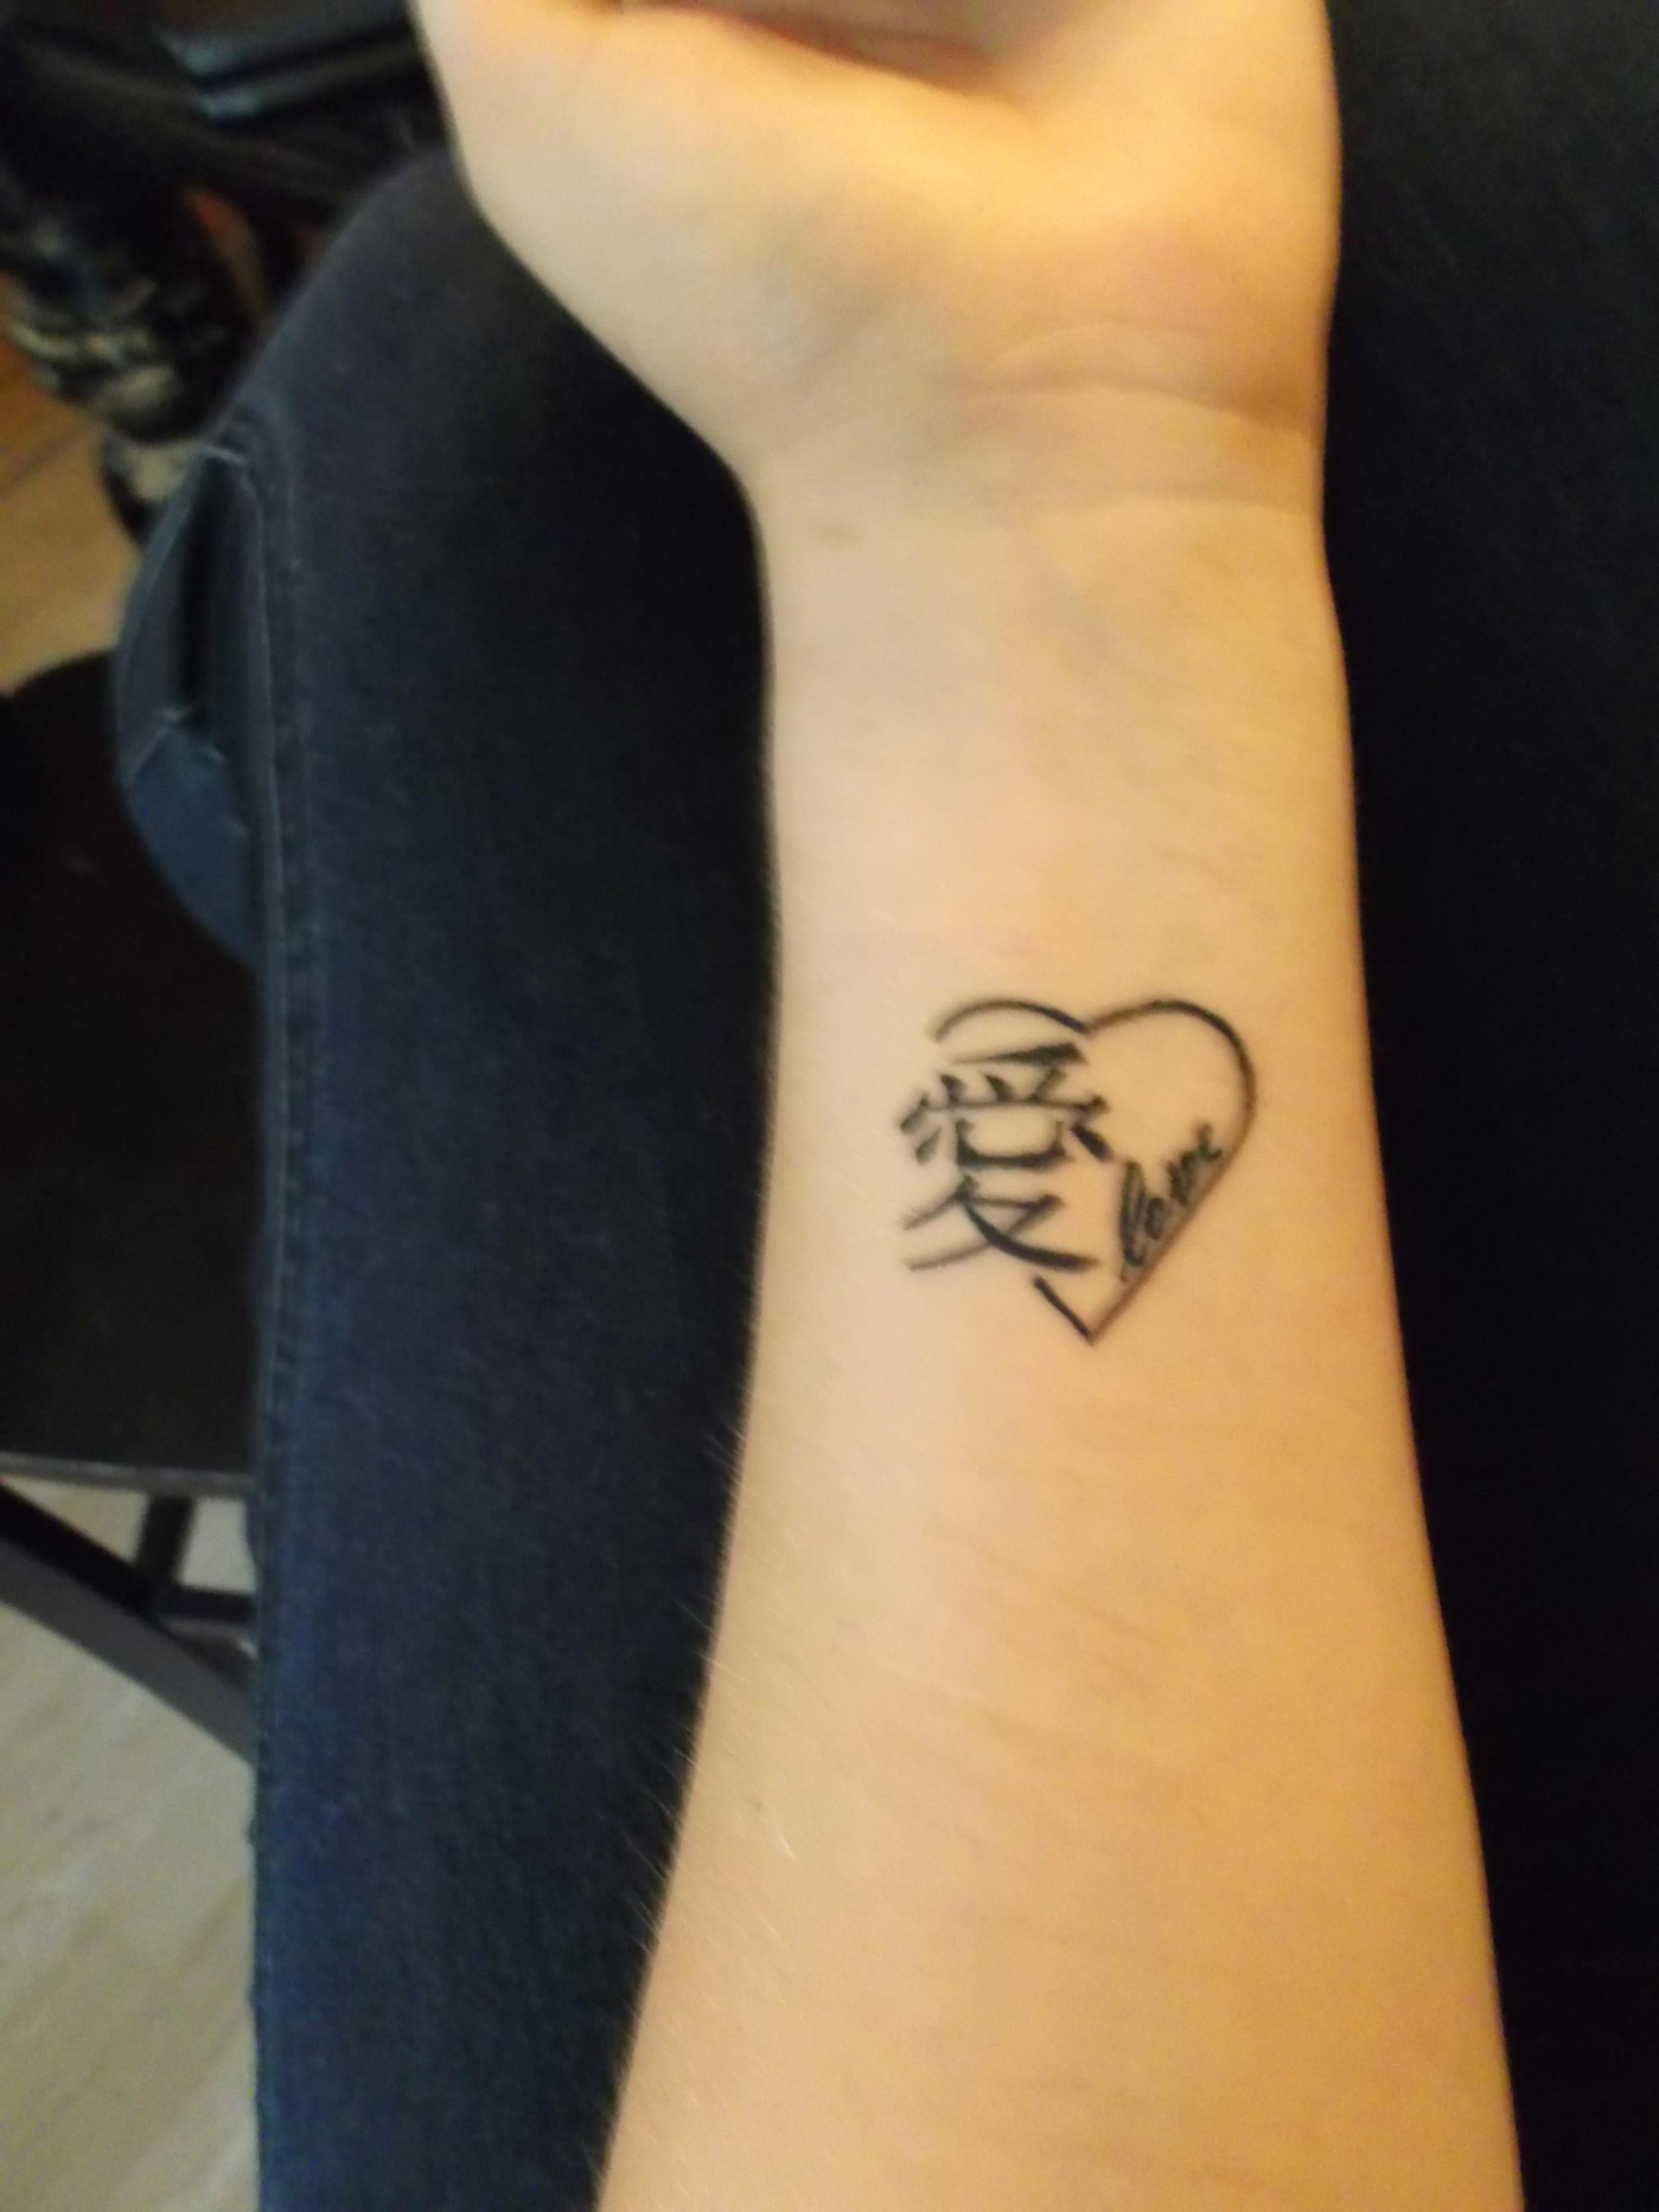 Symbol tattoos love symbol tattoos designs and ideas biocorpaavc